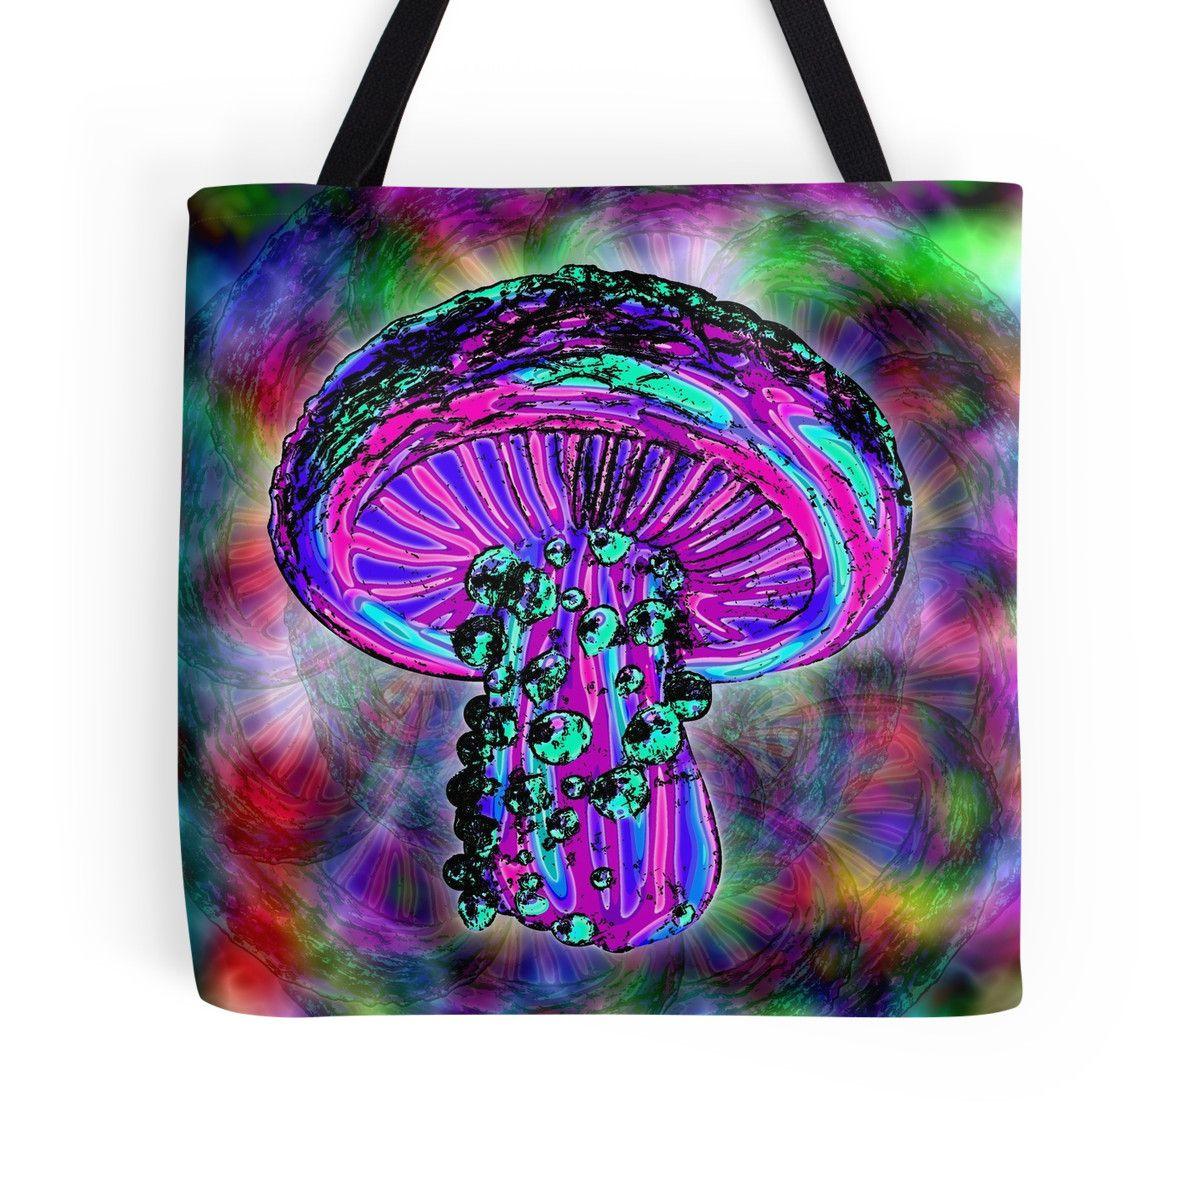 Trippy Shroom tote bag by GrimDork. shrooms, colorful, 420